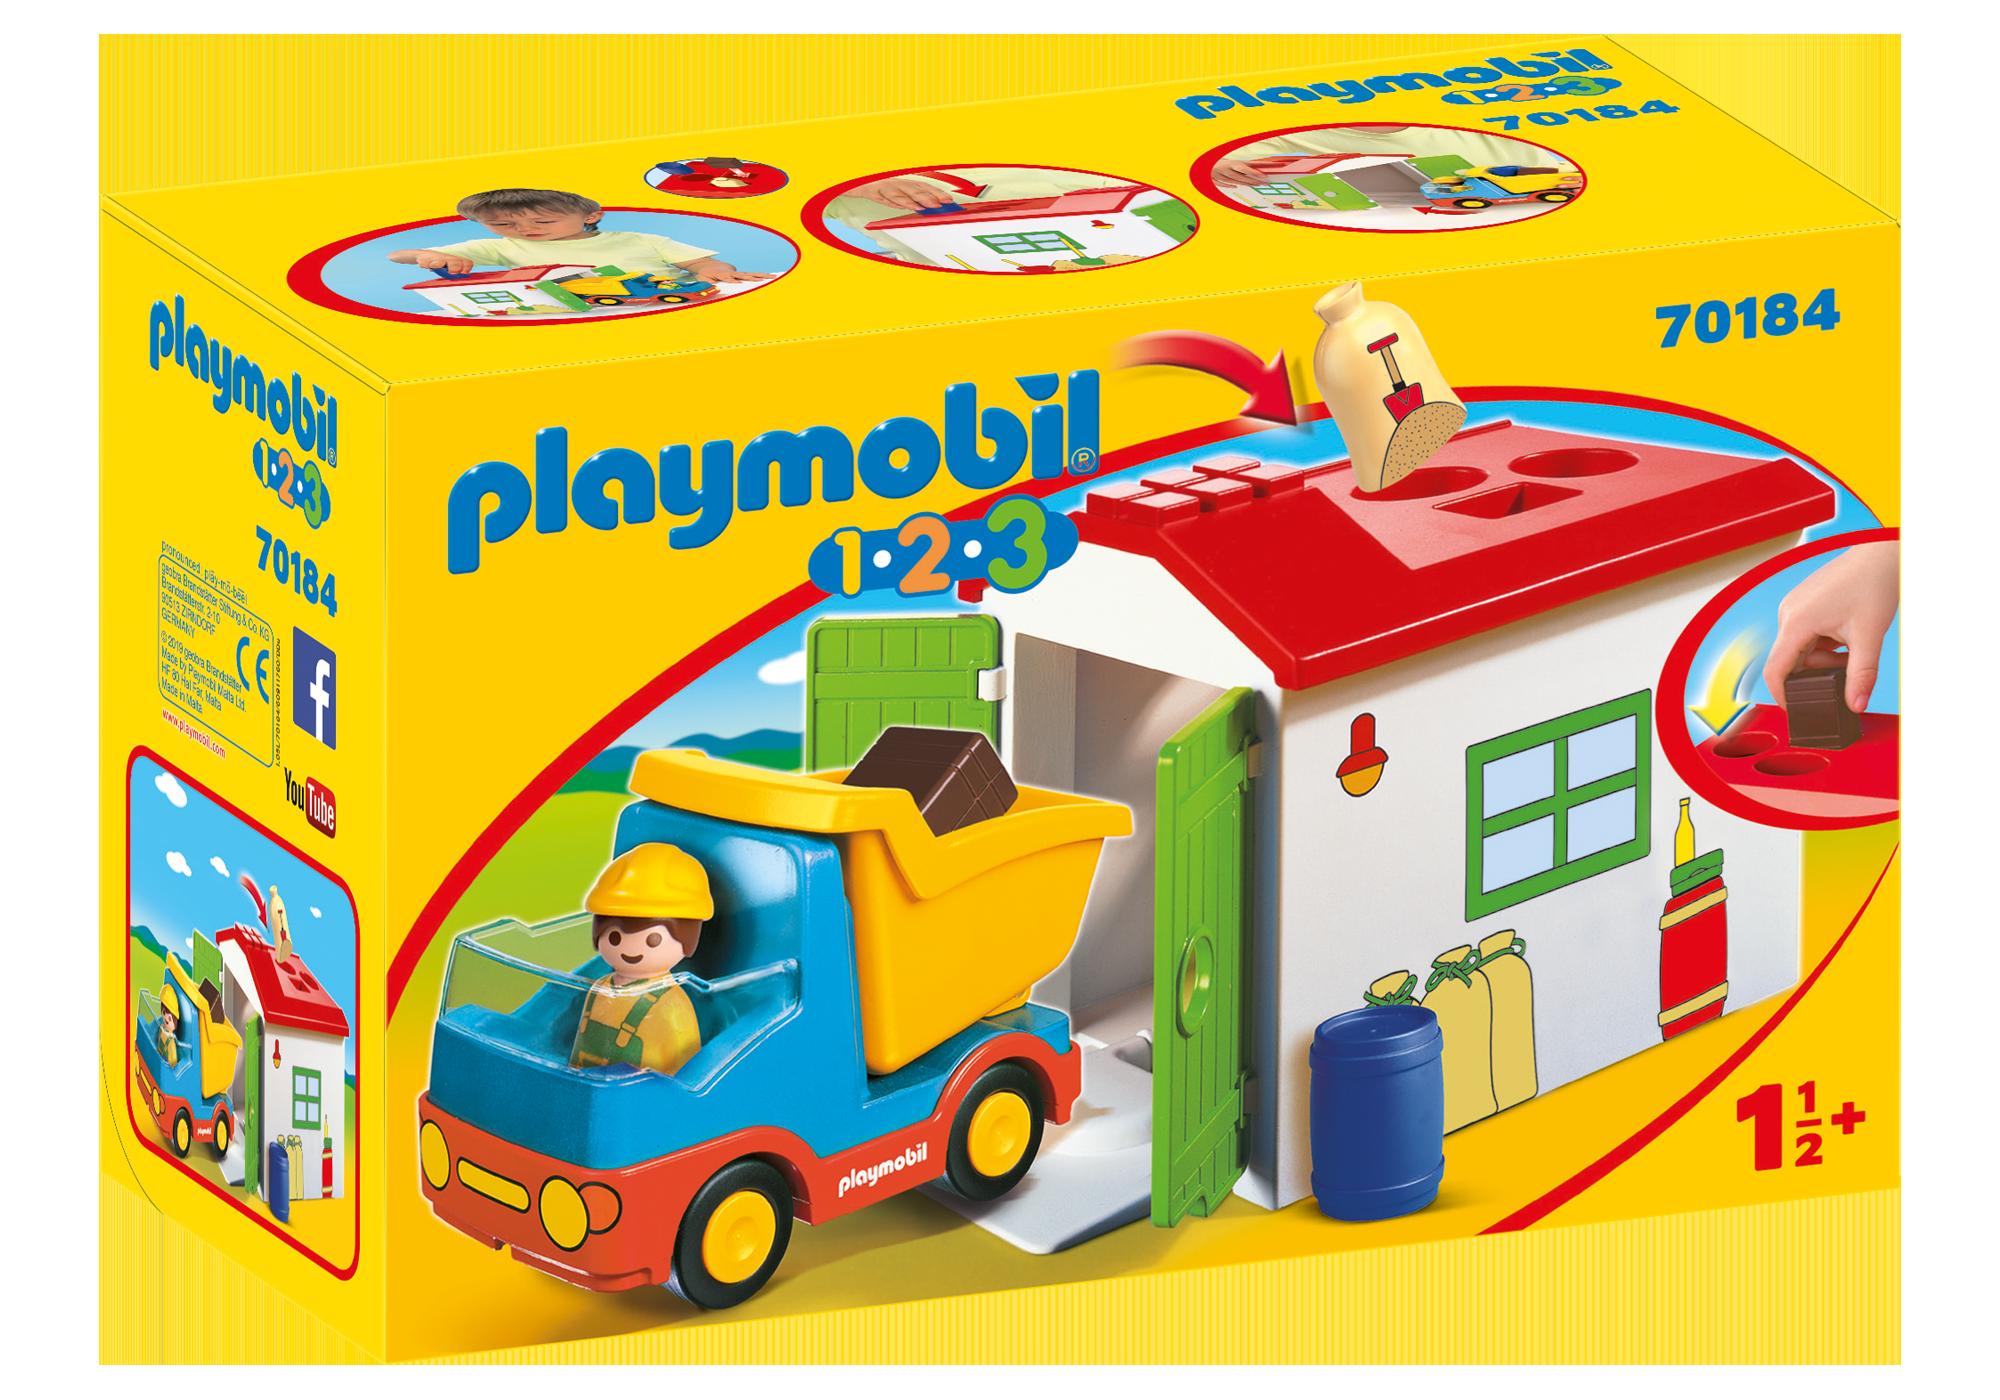 http://media.playmobil.com/i/playmobil/70184_product_box_front/Skraldebil